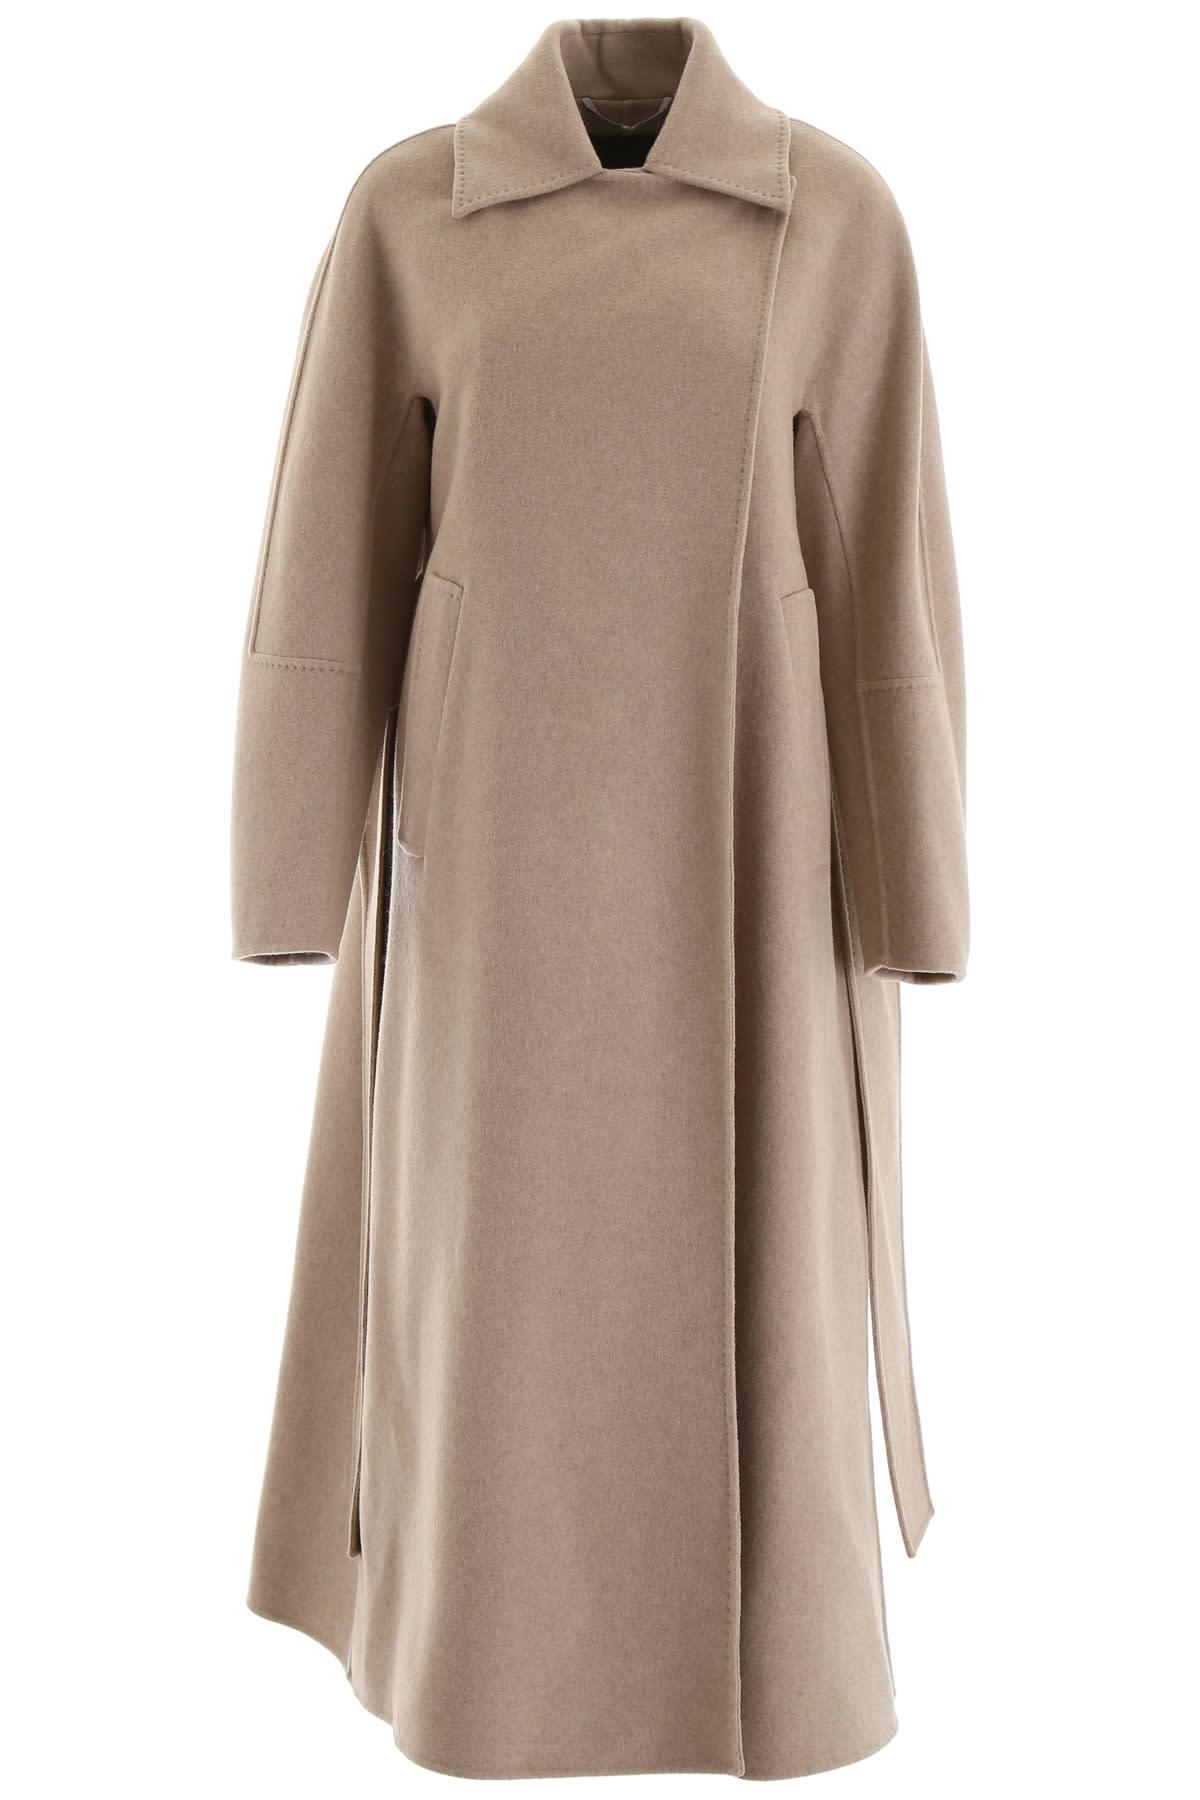 Max Mara Atelier Chiara Coat